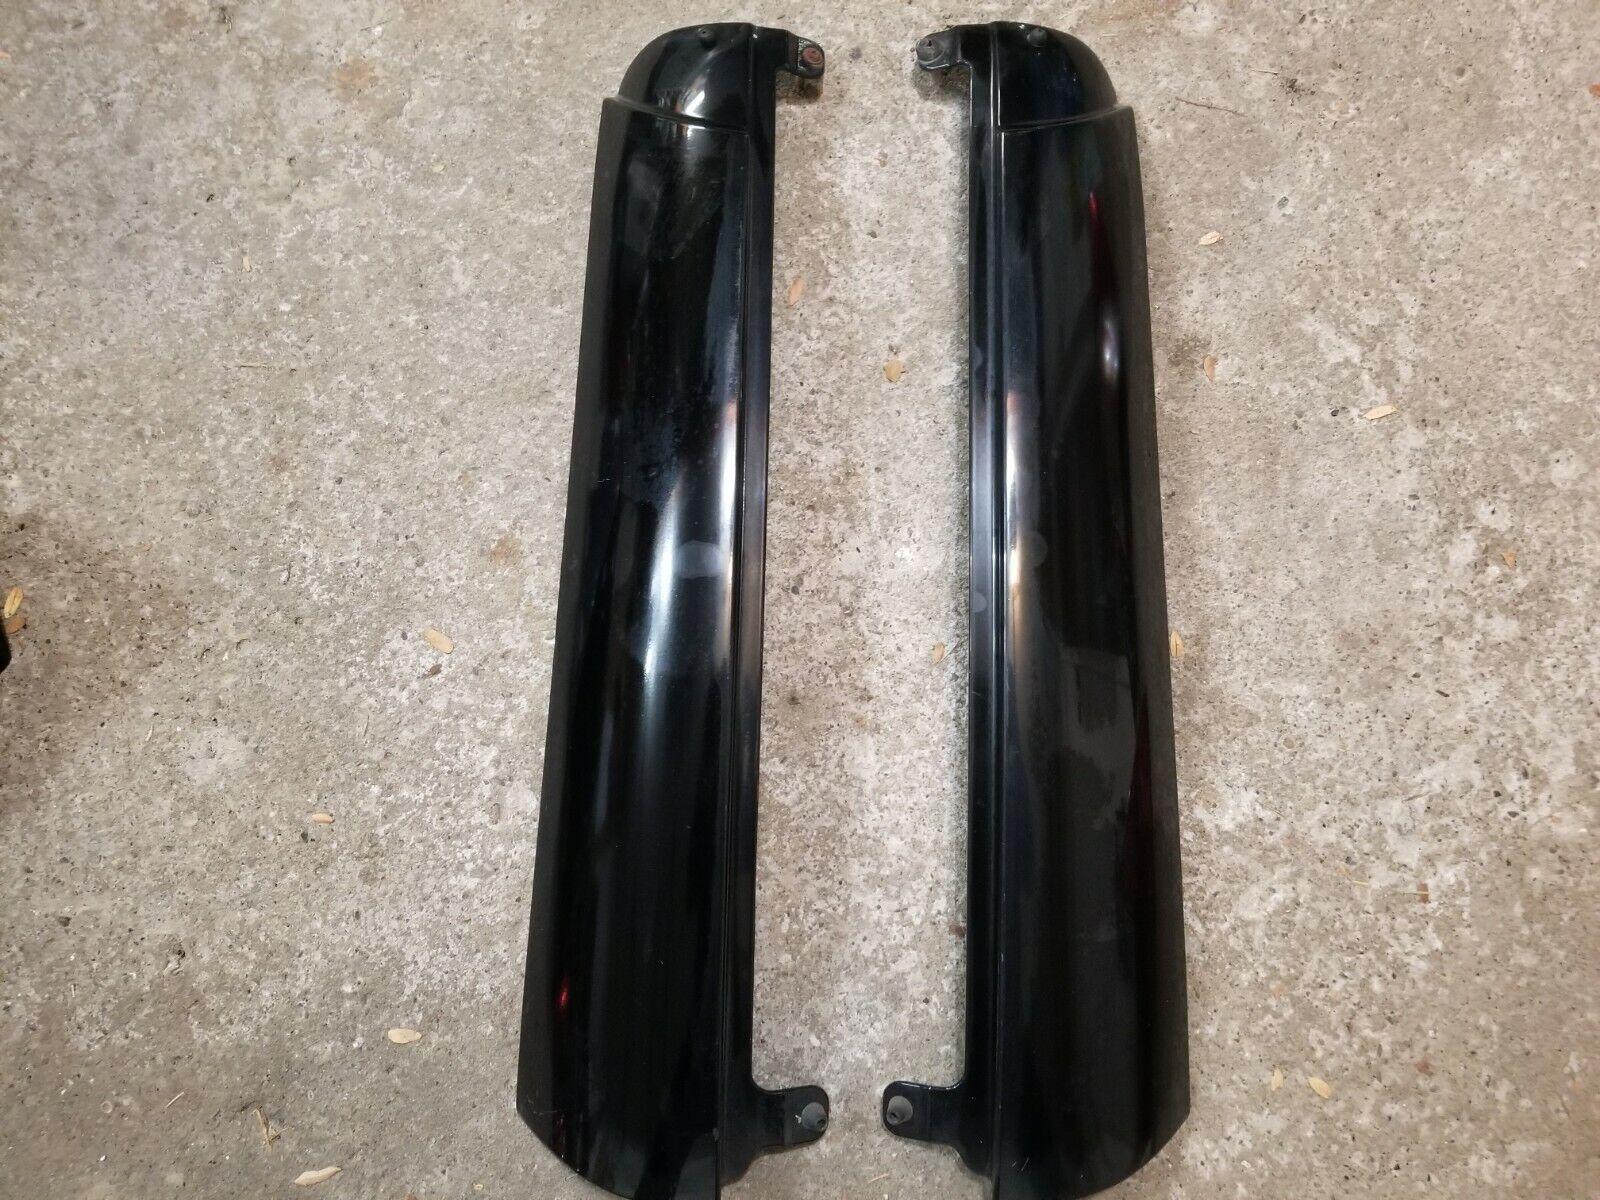 02-09 Chevy Trailblazer Rear Lift Gate Trim Molding Left /& Right Chevrolet